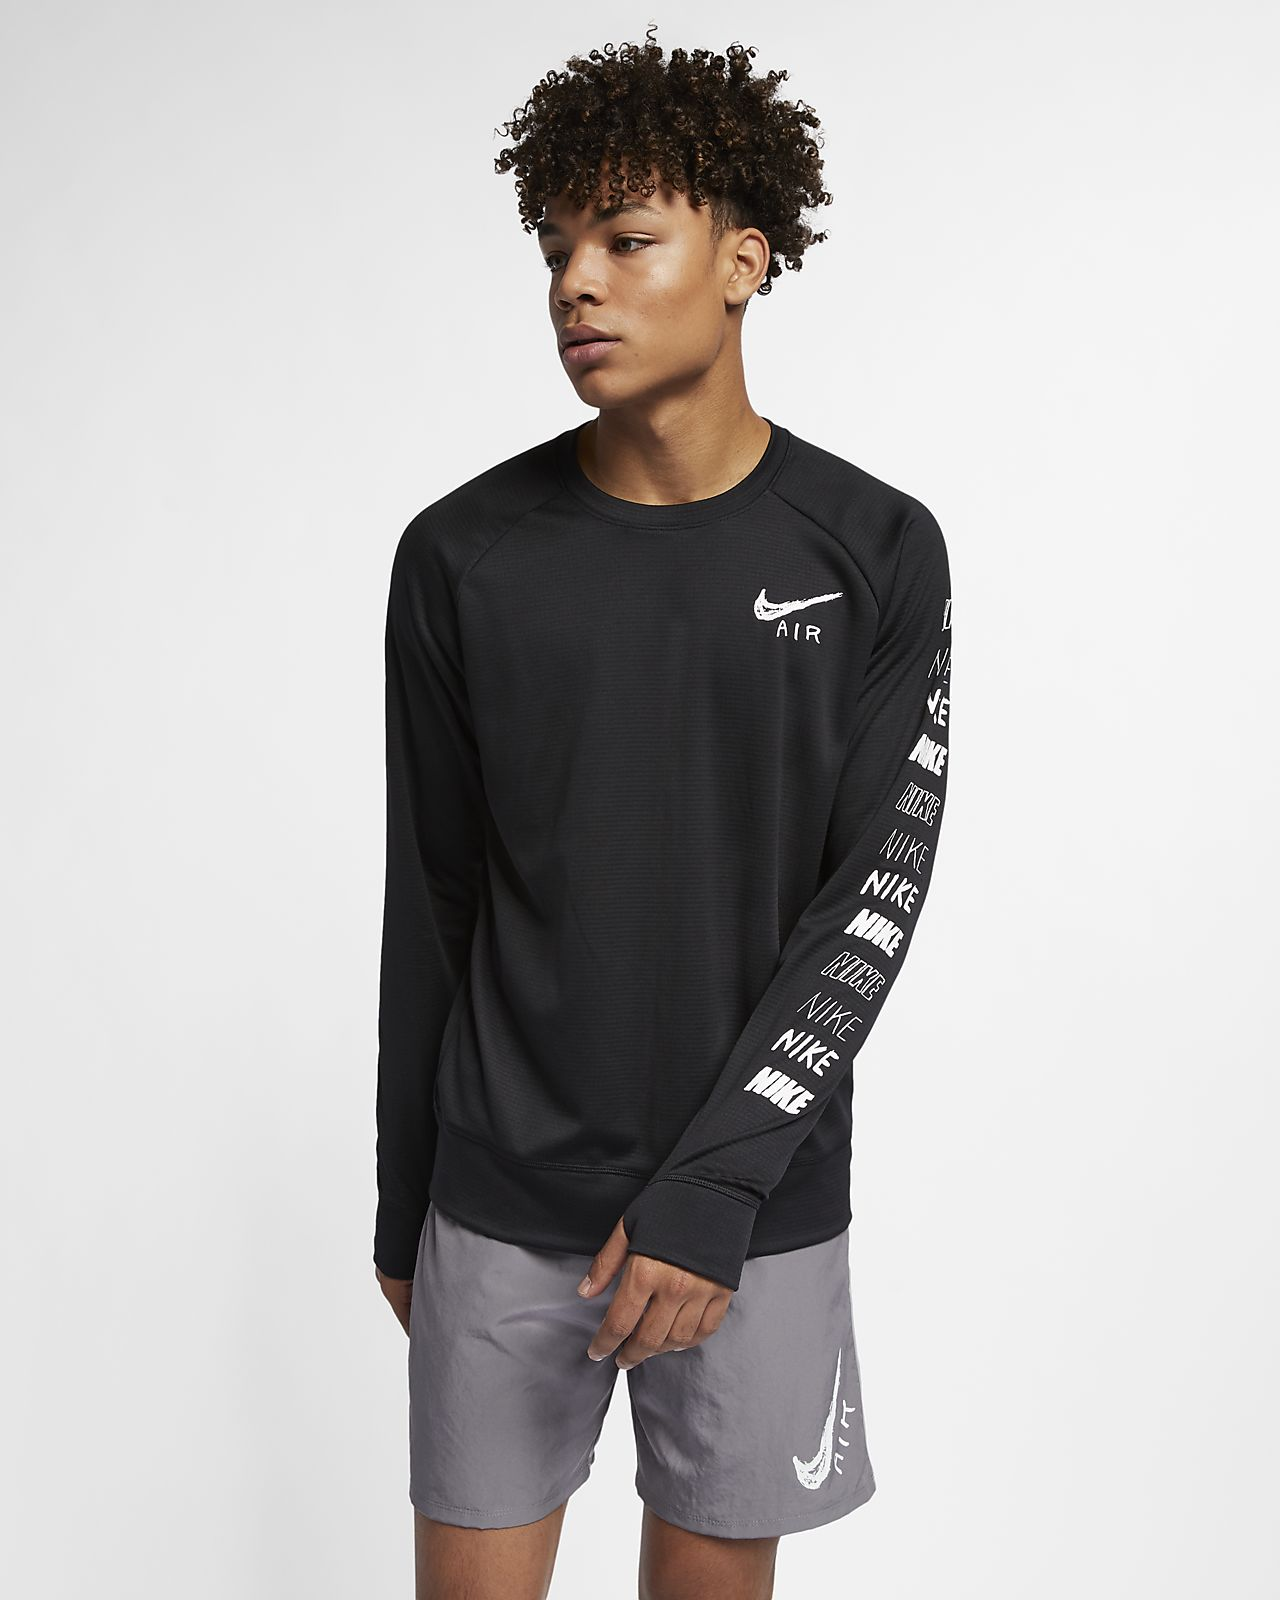 Camisola de running Nike Pacer para homem